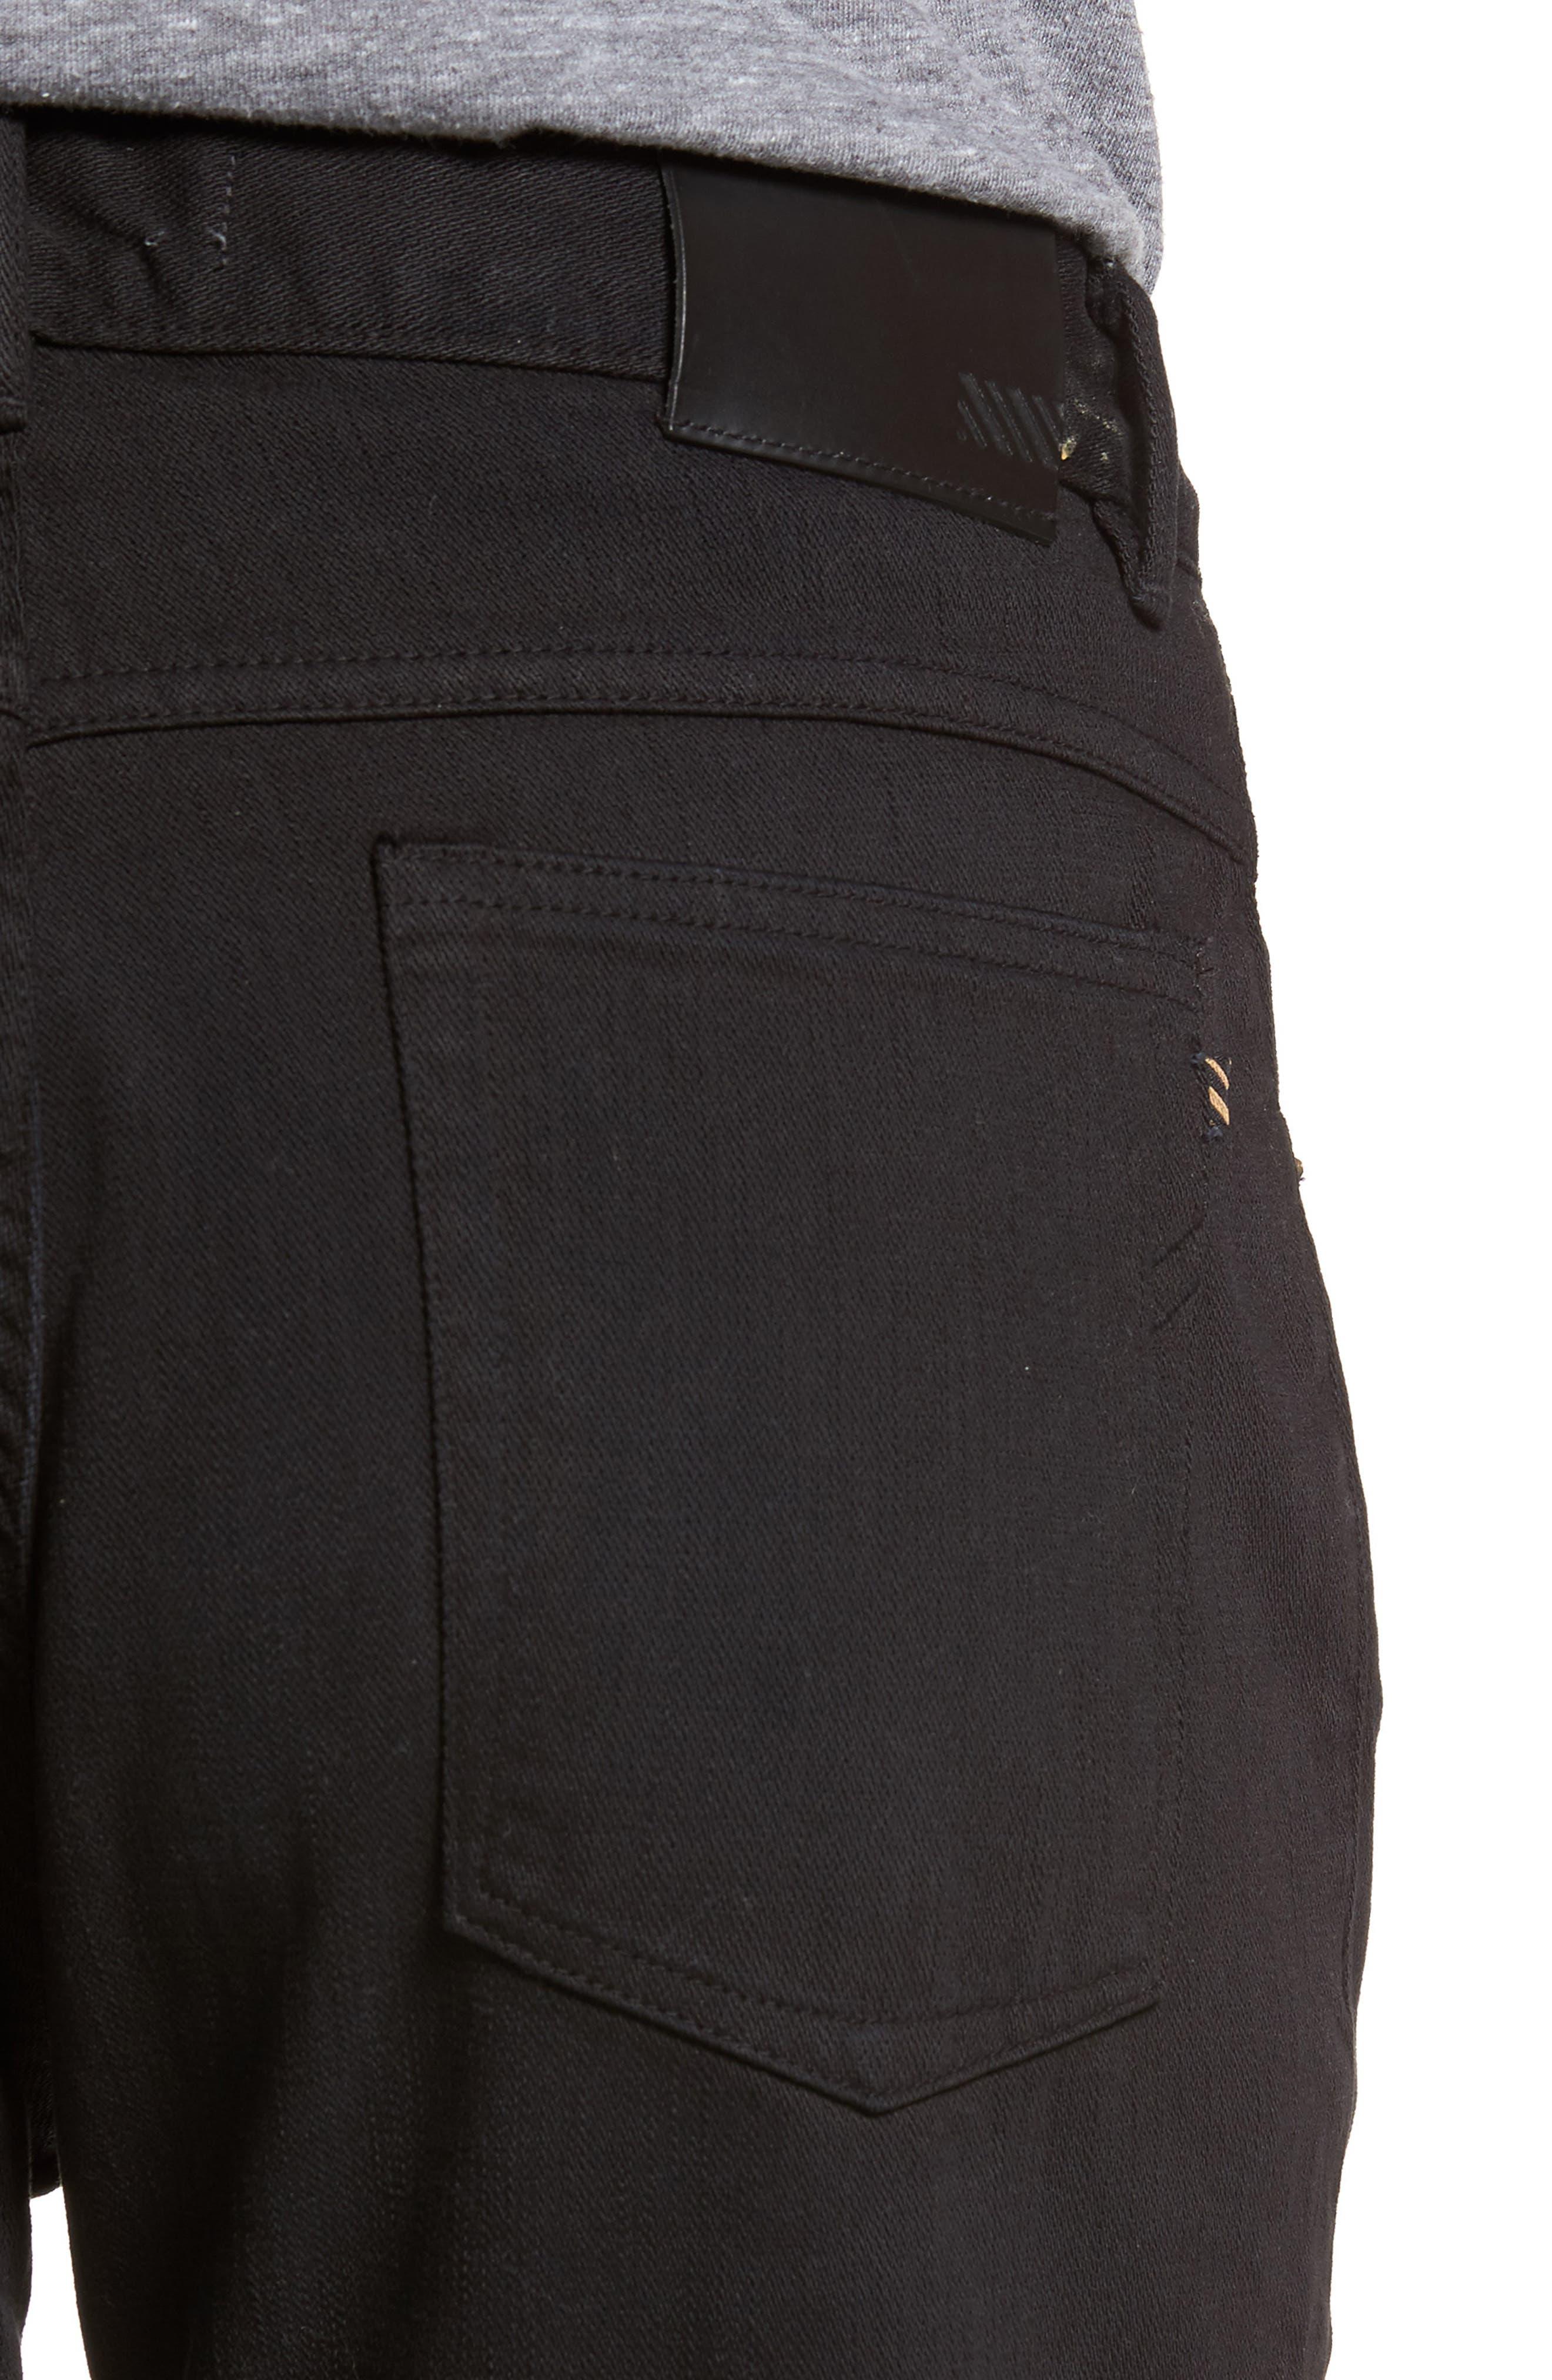 Slim Straight Leg Pants,                             Alternate thumbnail 4, color,                             001